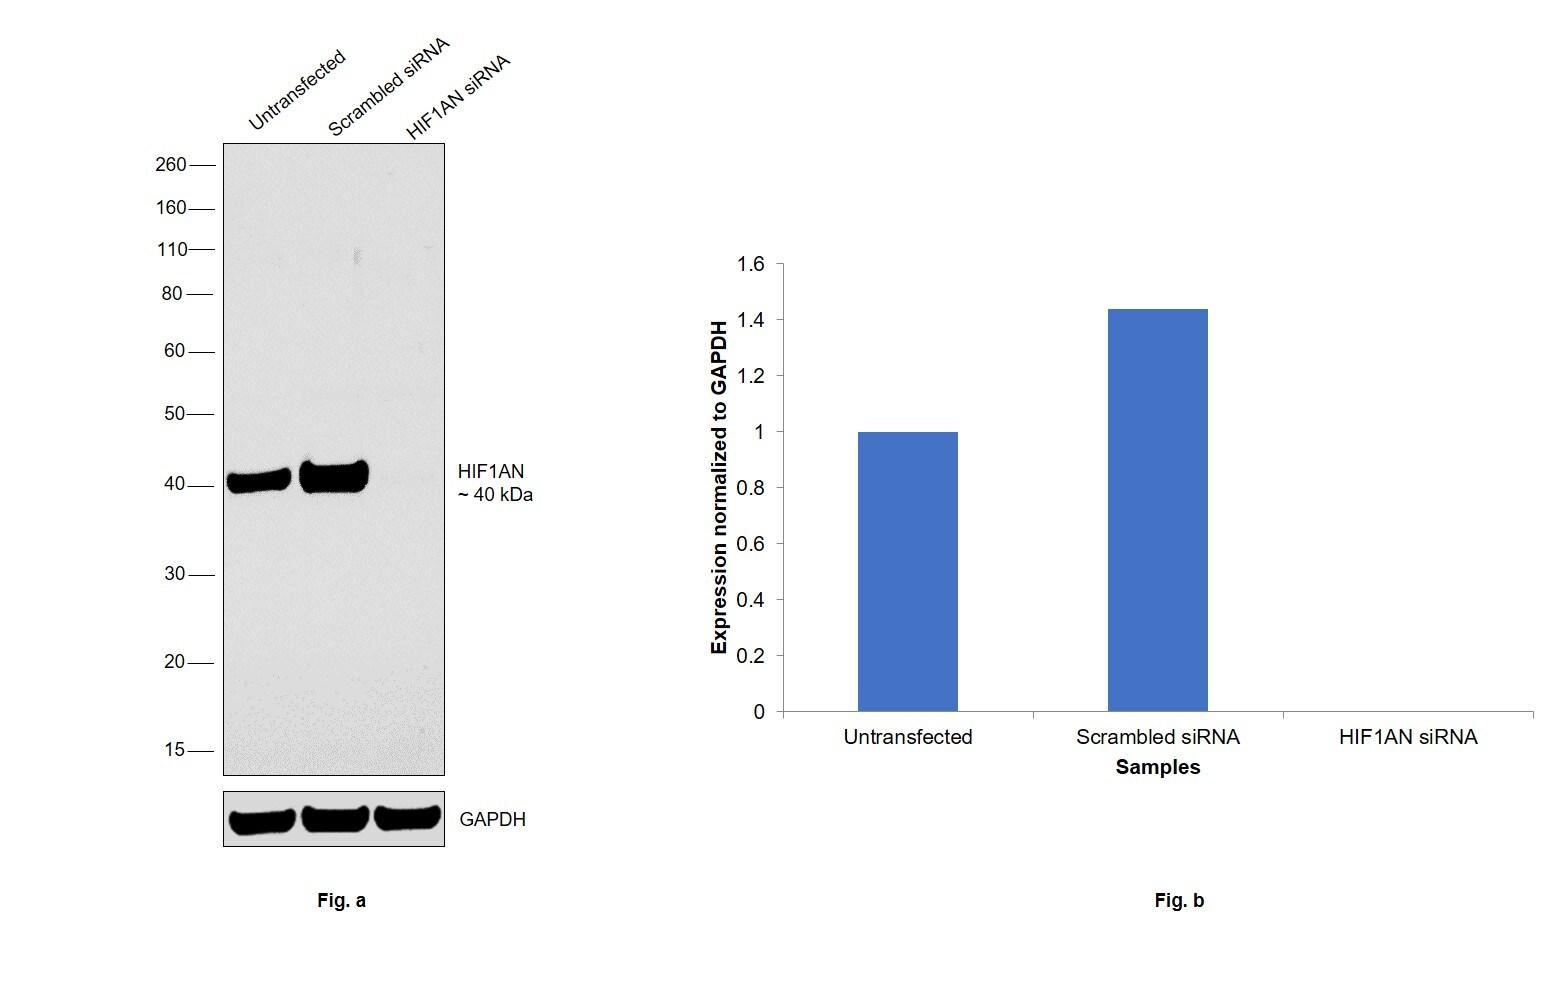 HIF1AN Antibody in Knockdown